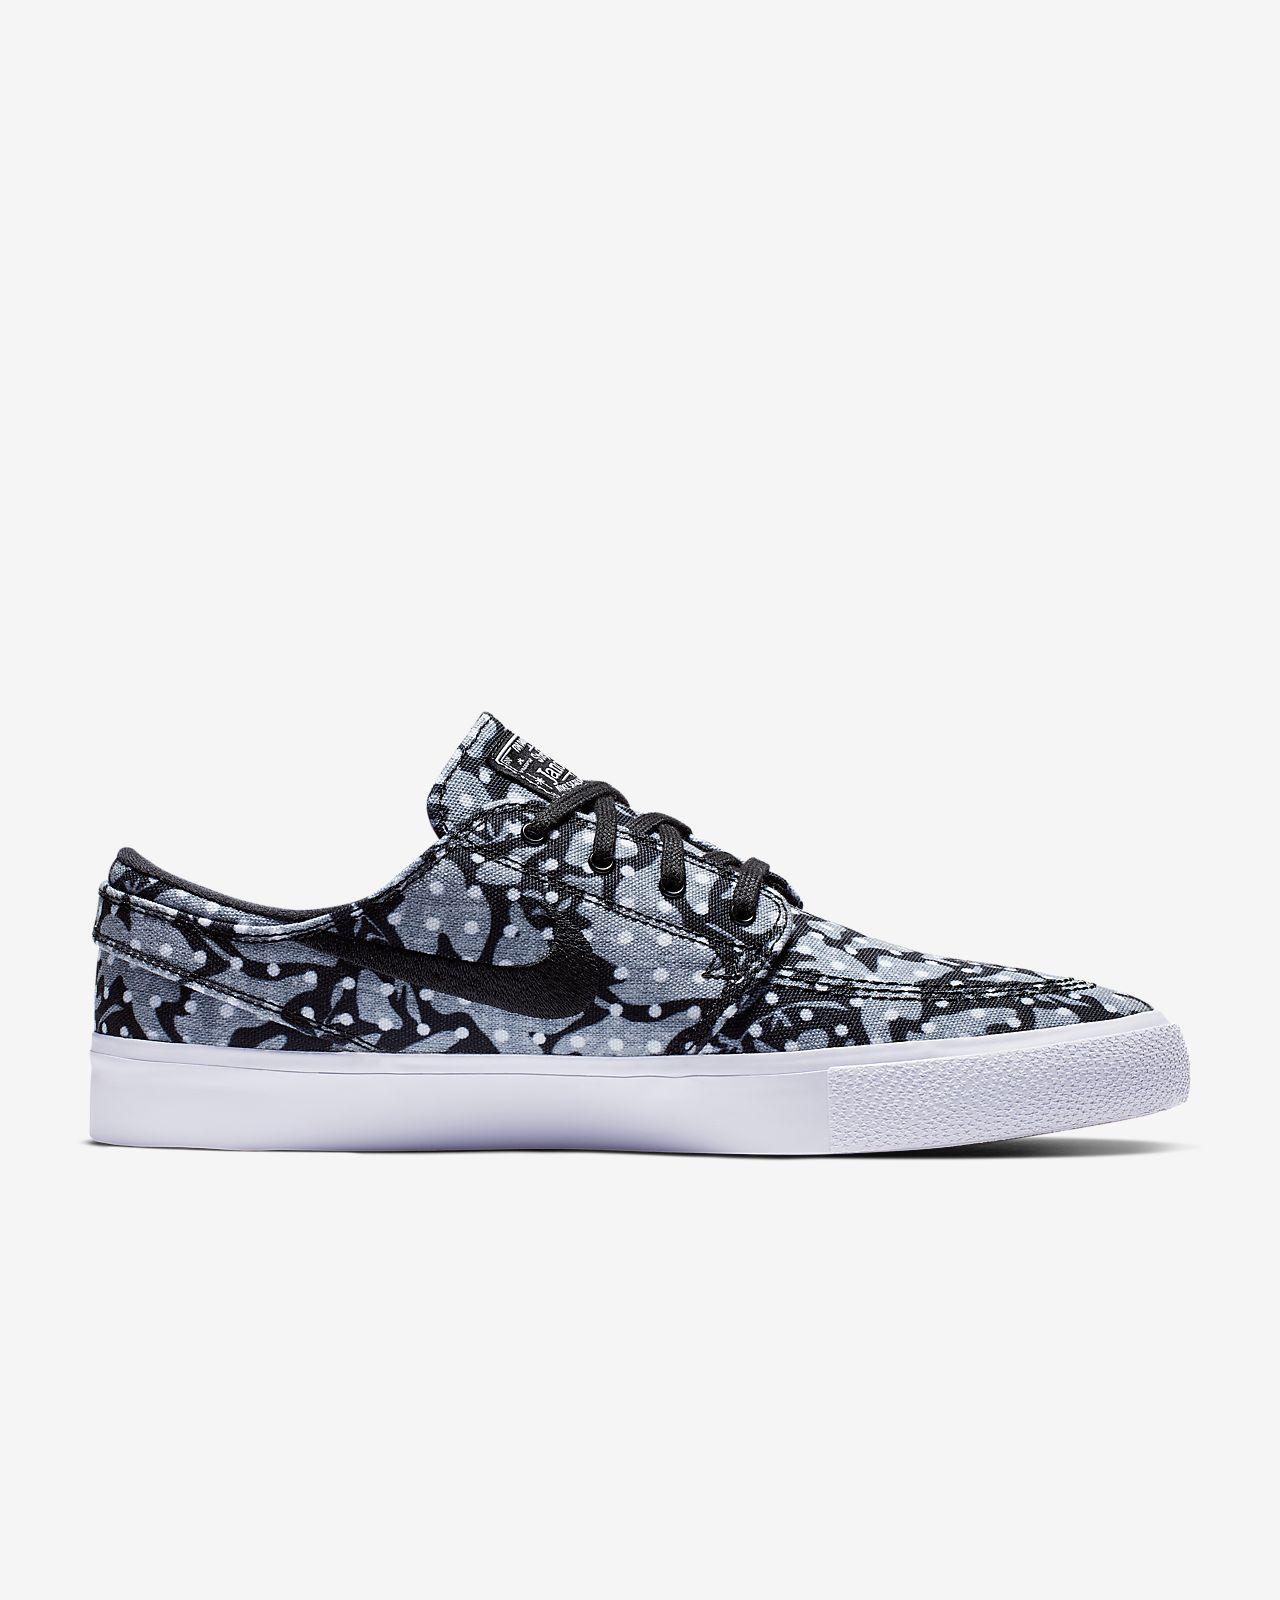 ad401eeddc99e Chaussure de skateboard Nike SB Zoom Stefan Janoski Canvas RM. Nike ...